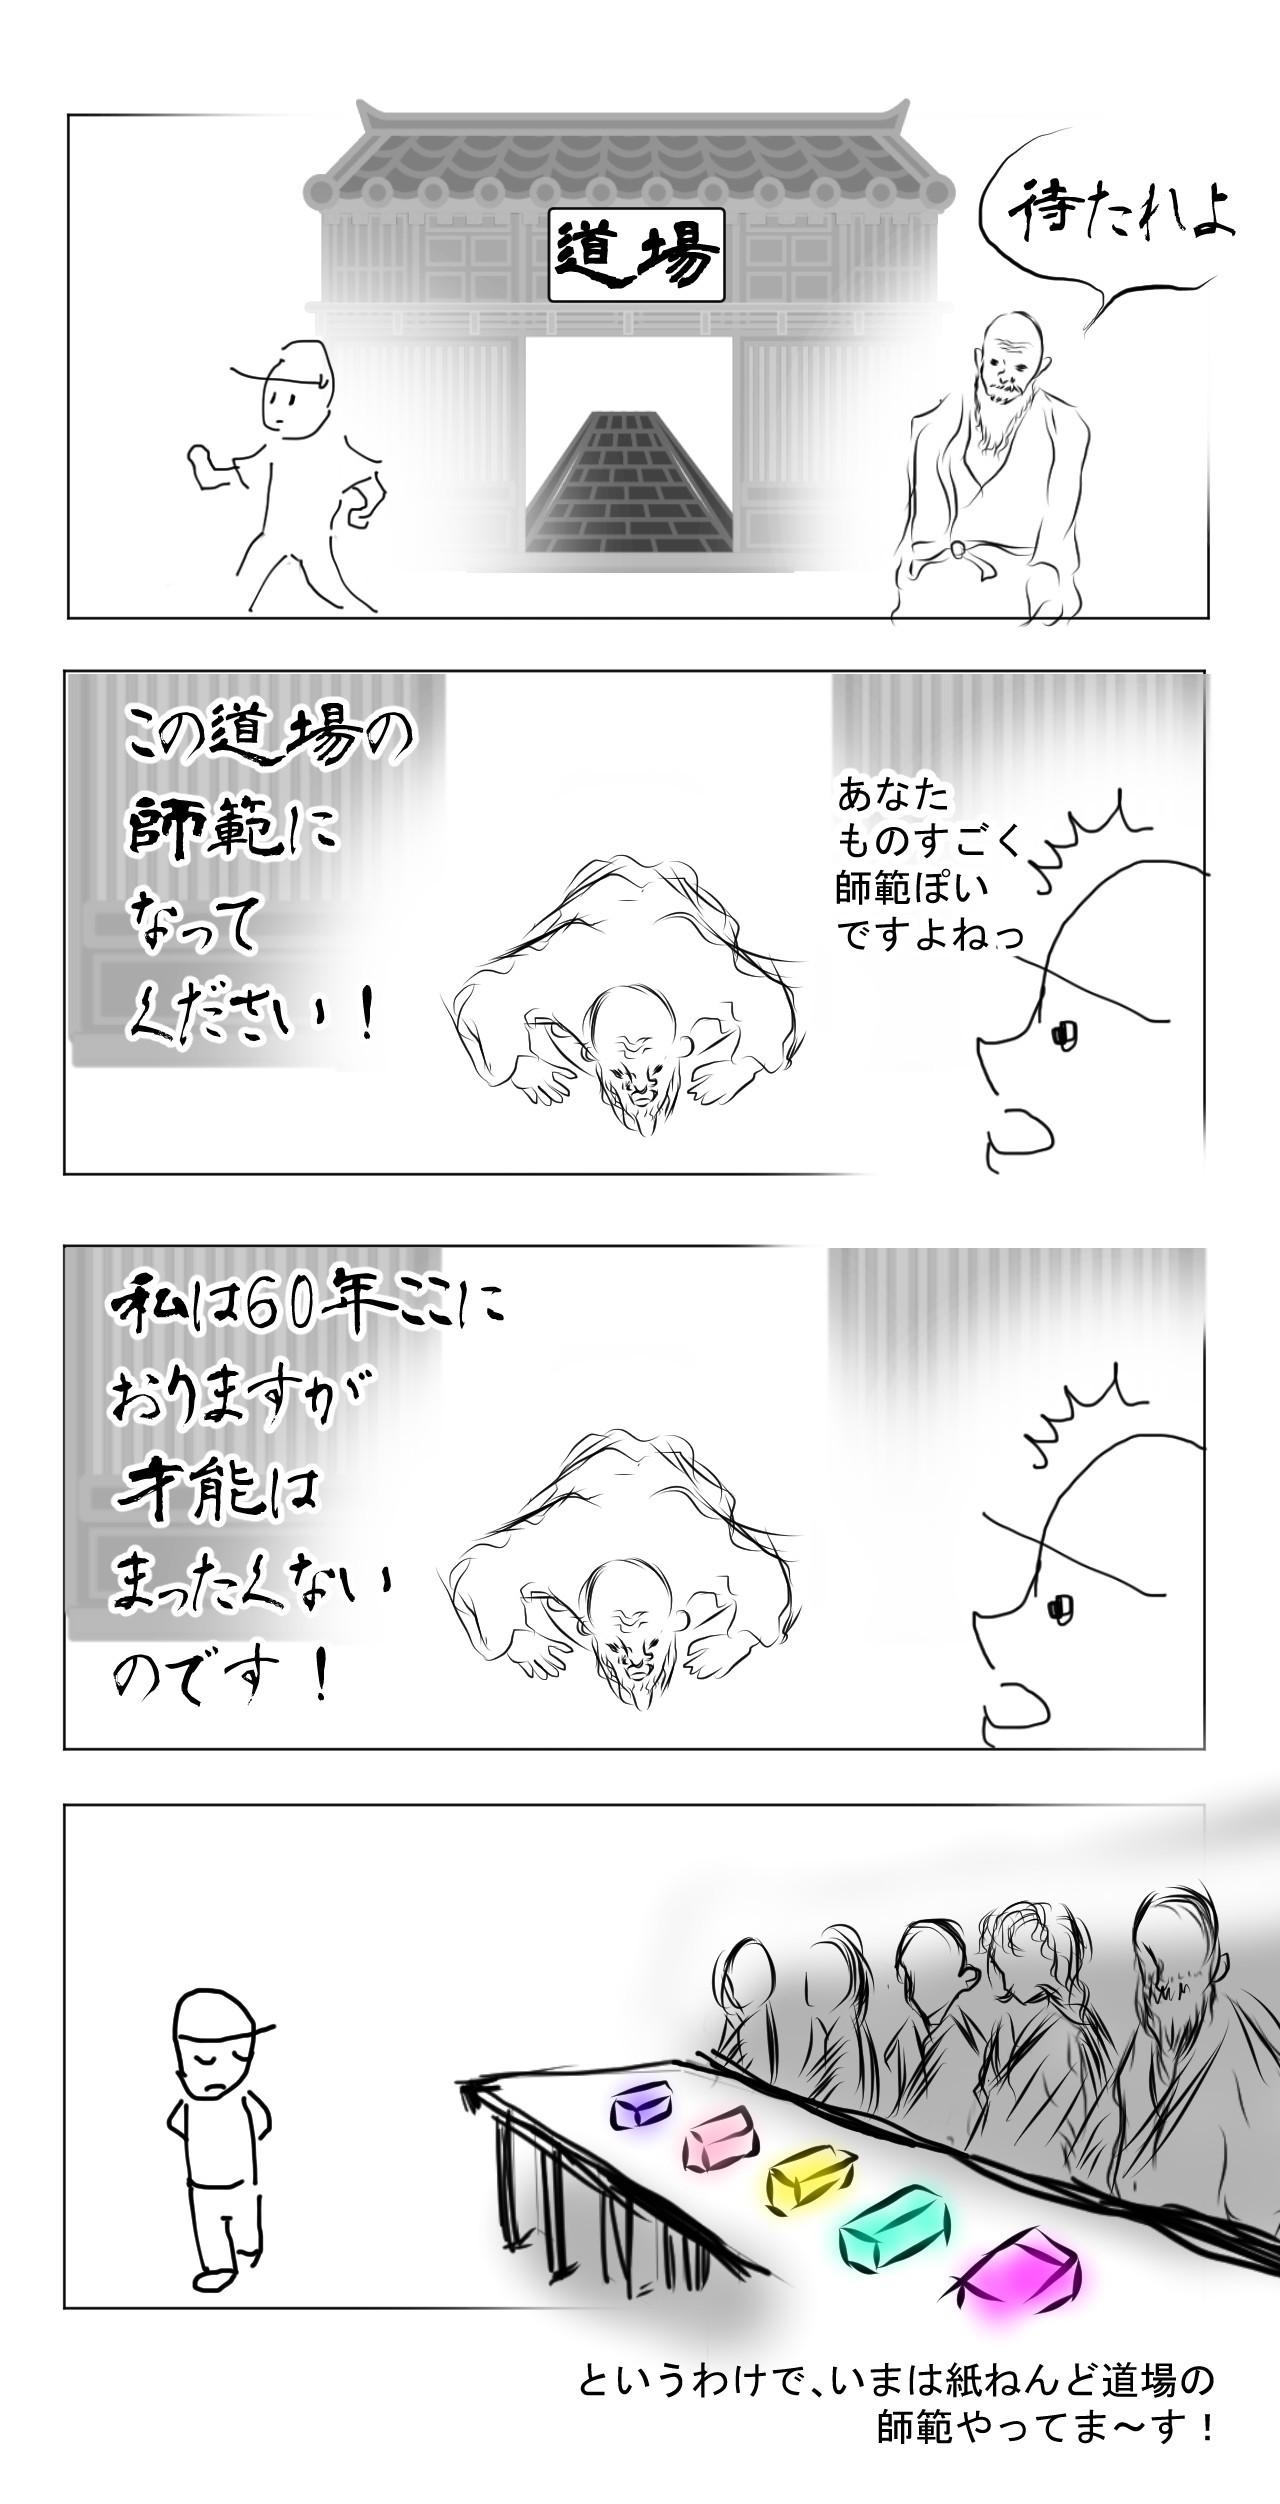 tori_-_コピー__2_